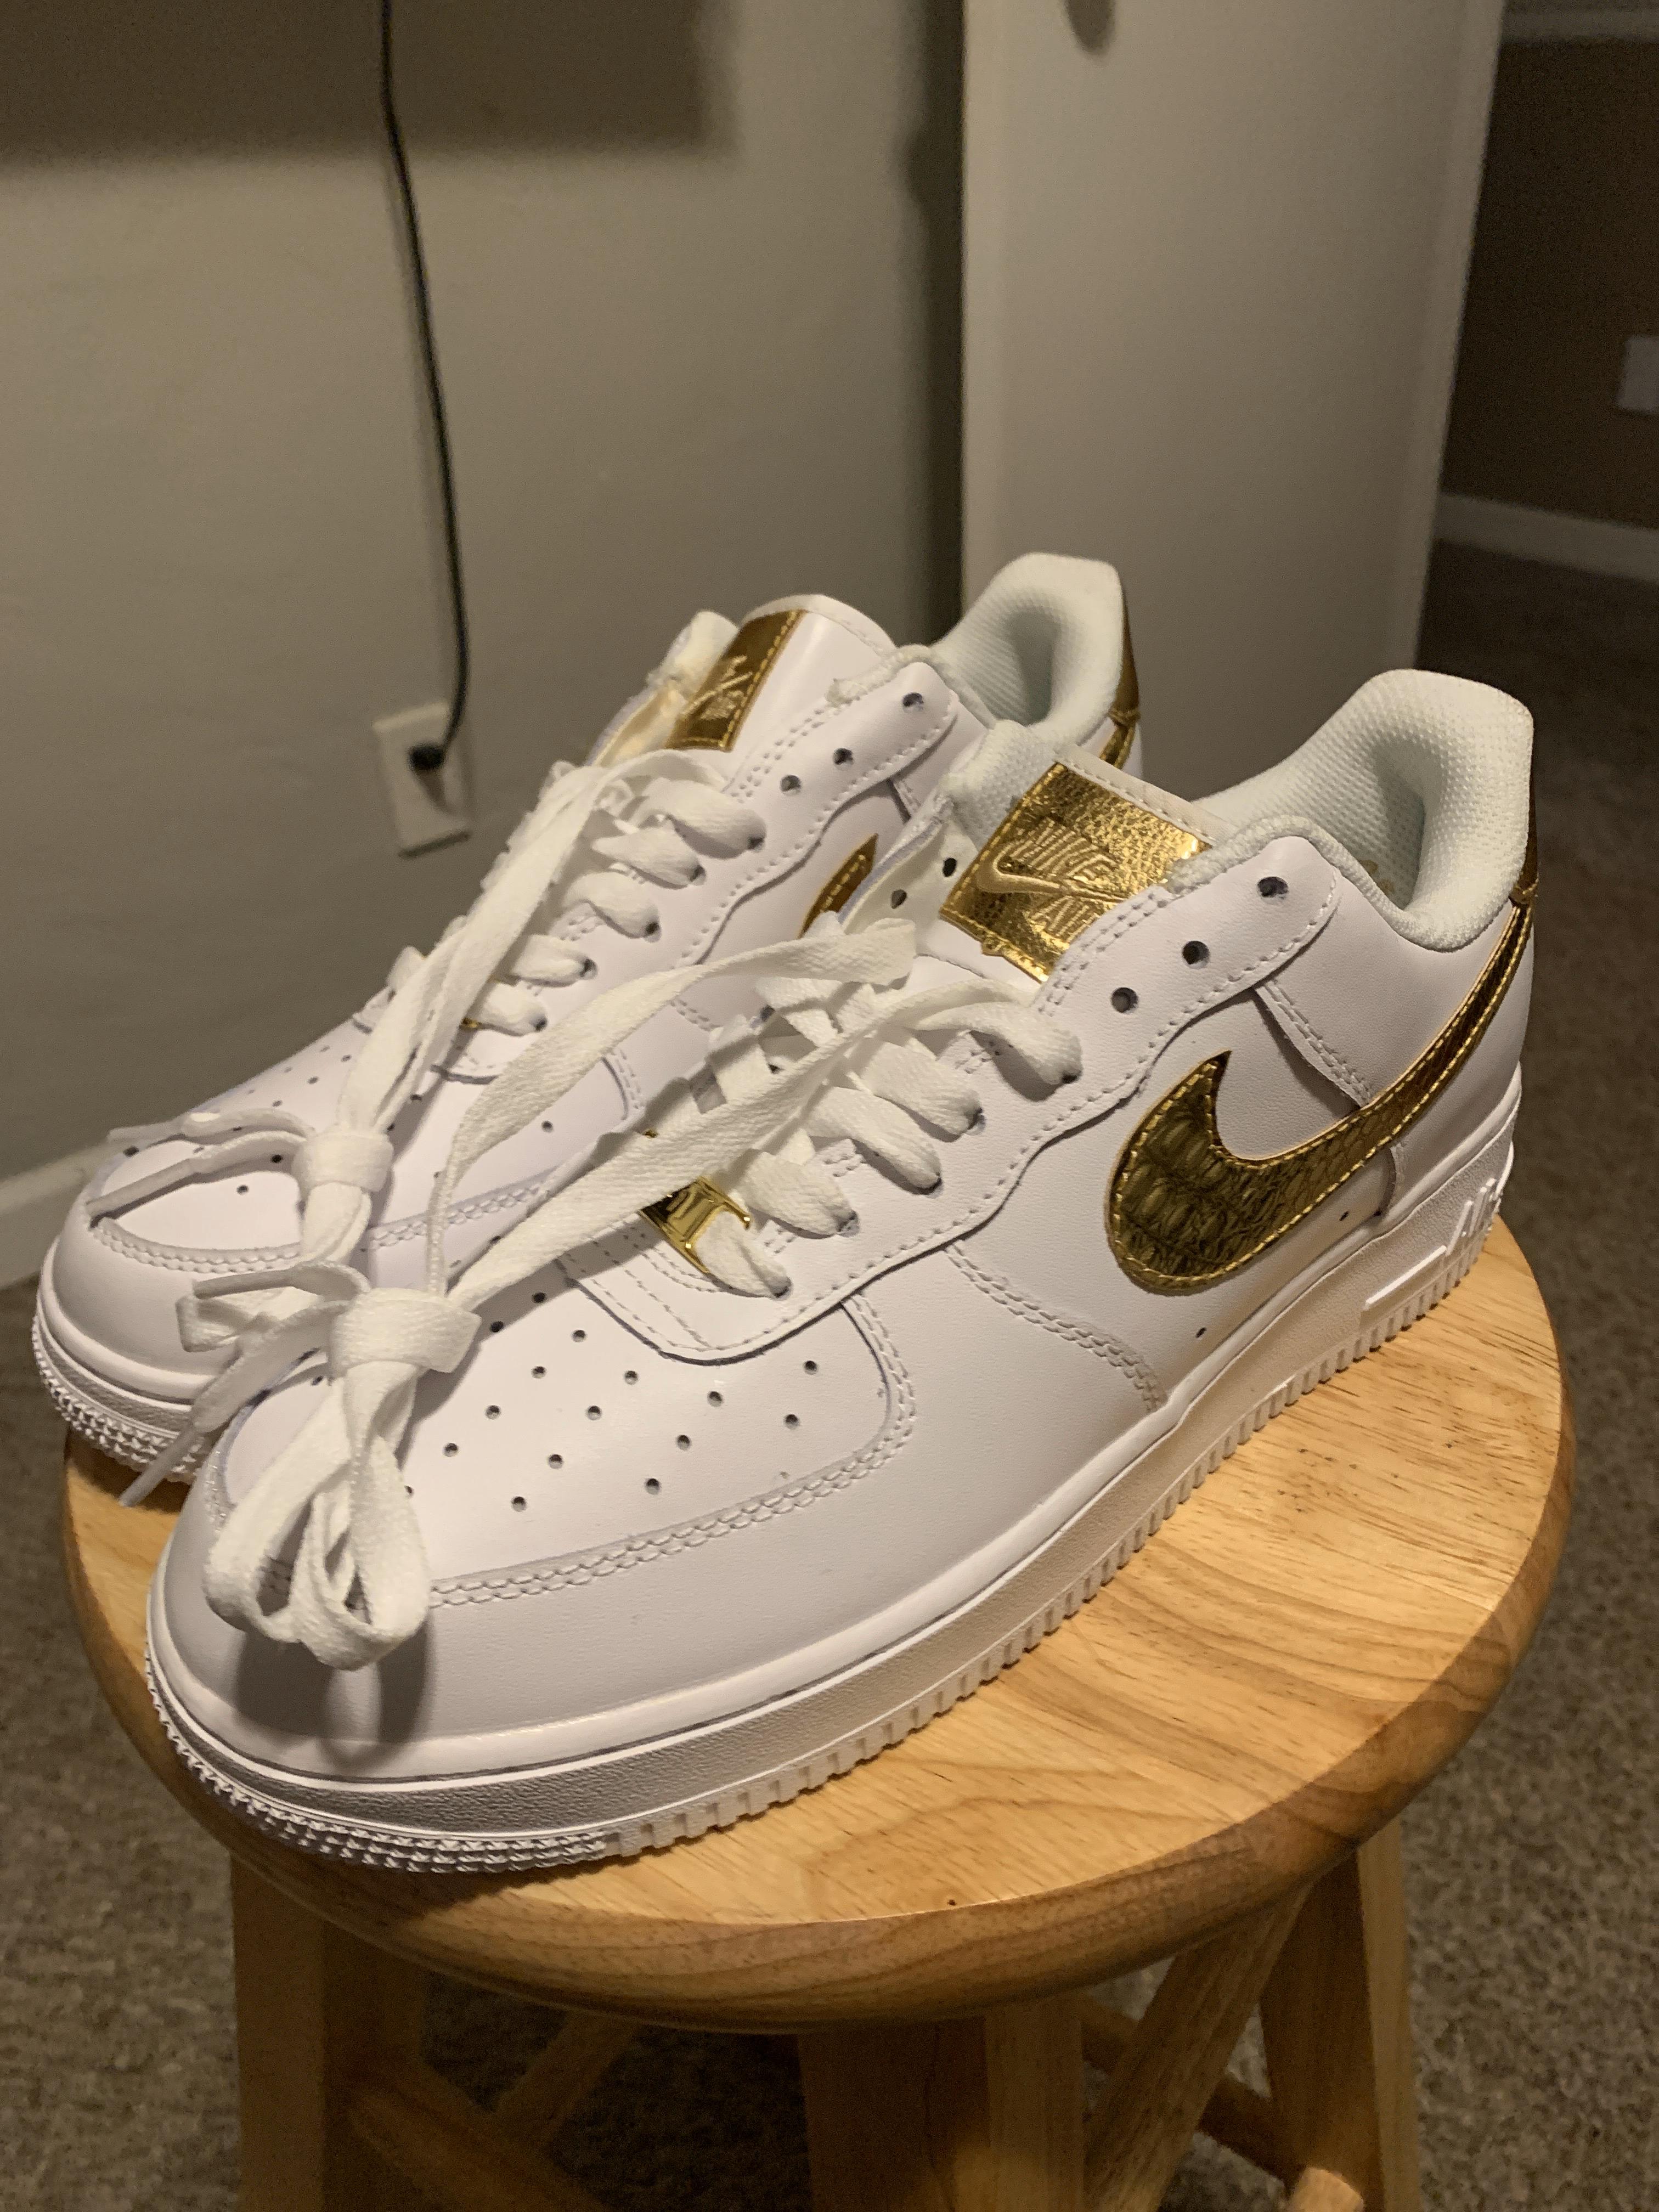 Air Jordan - $460 - Size 8